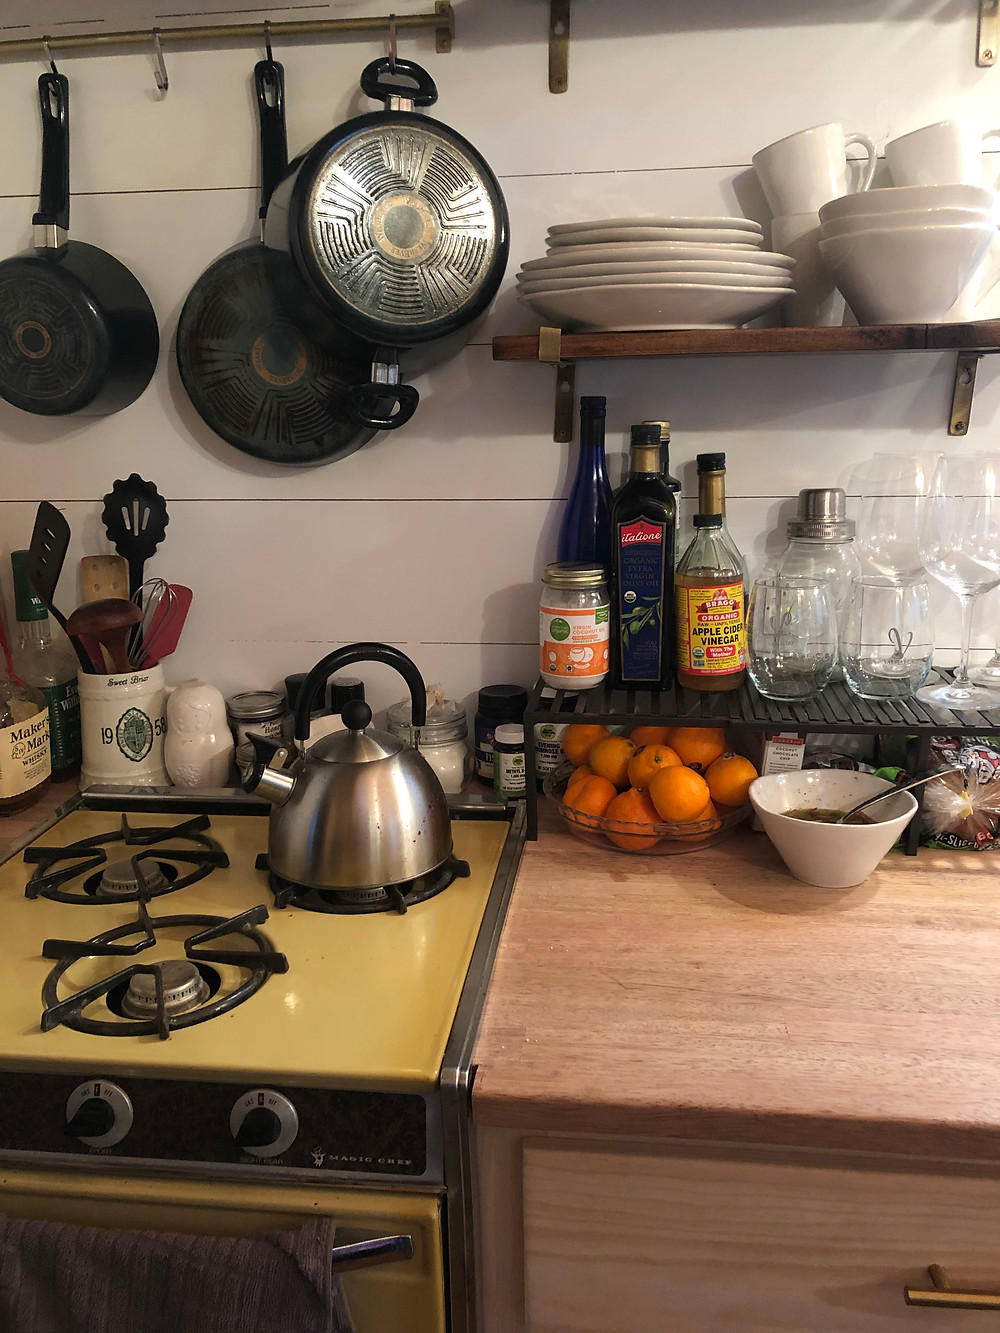 tiny house kitchen vintage stove oven pot hanging racks open shelving tea kettle butcher block countertops